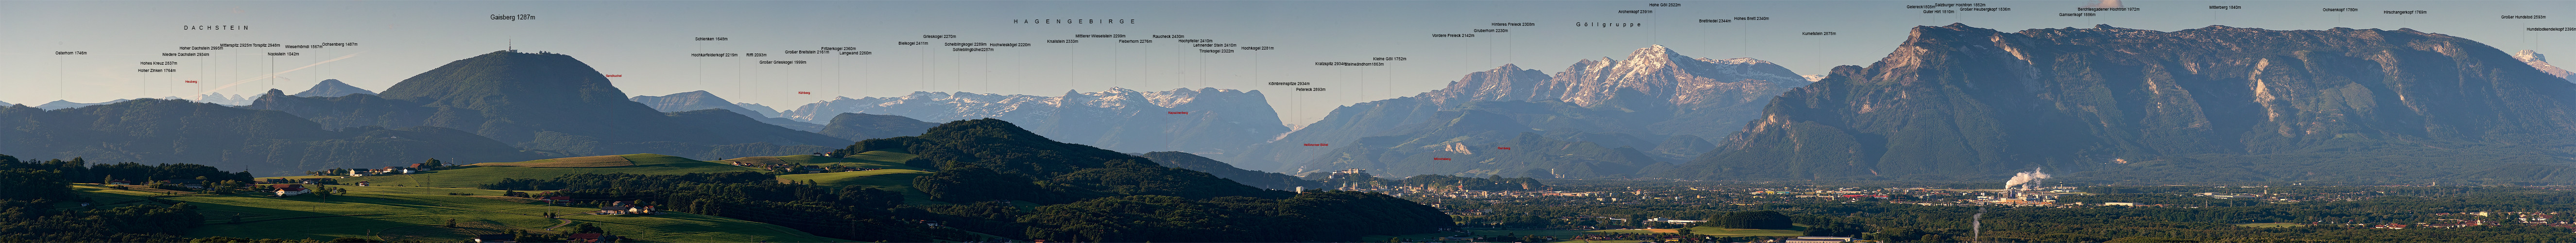 Blick ins Salzburger Alpenvorland III